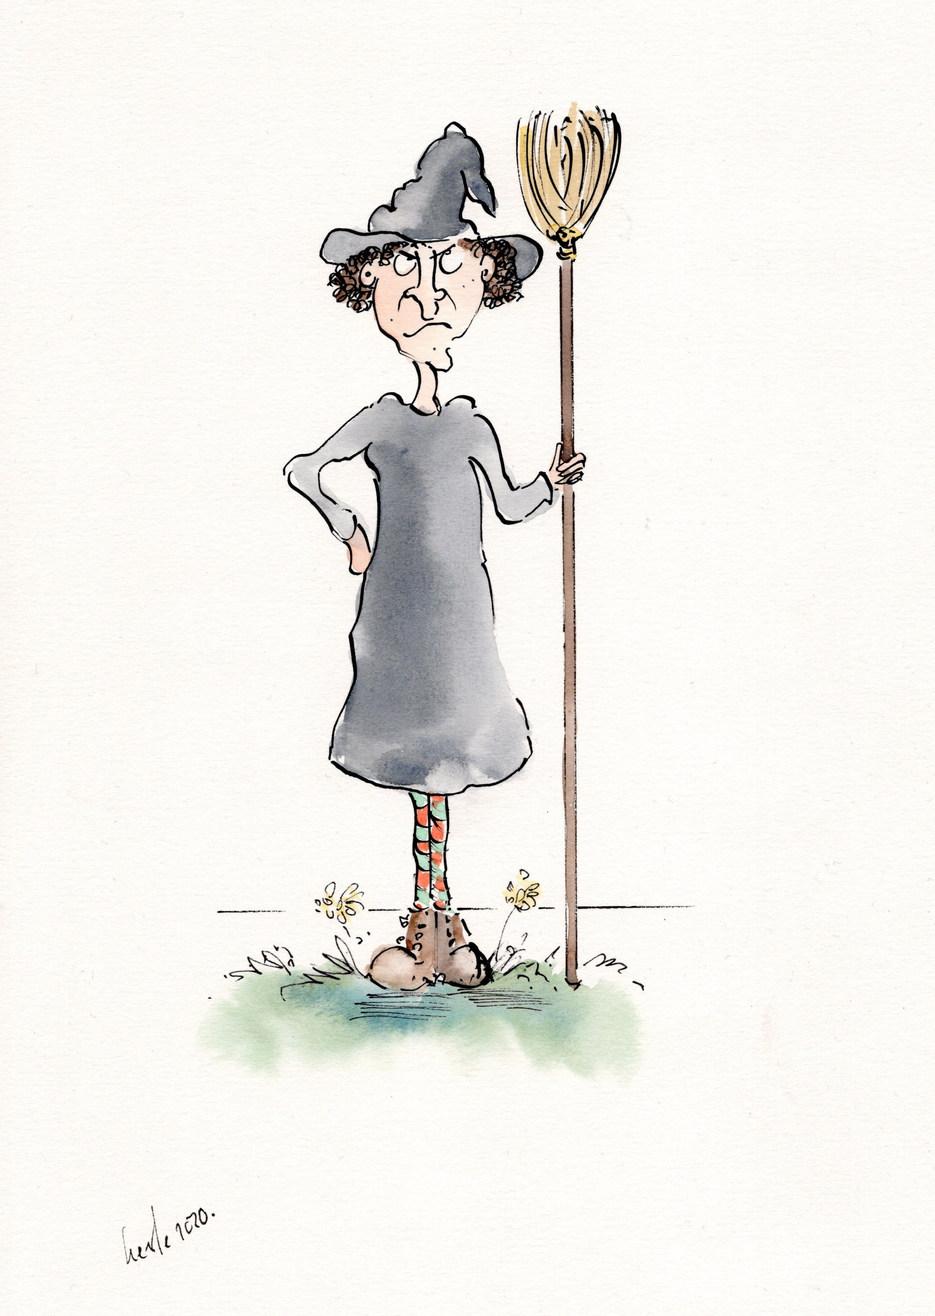 Agatha & broomstick